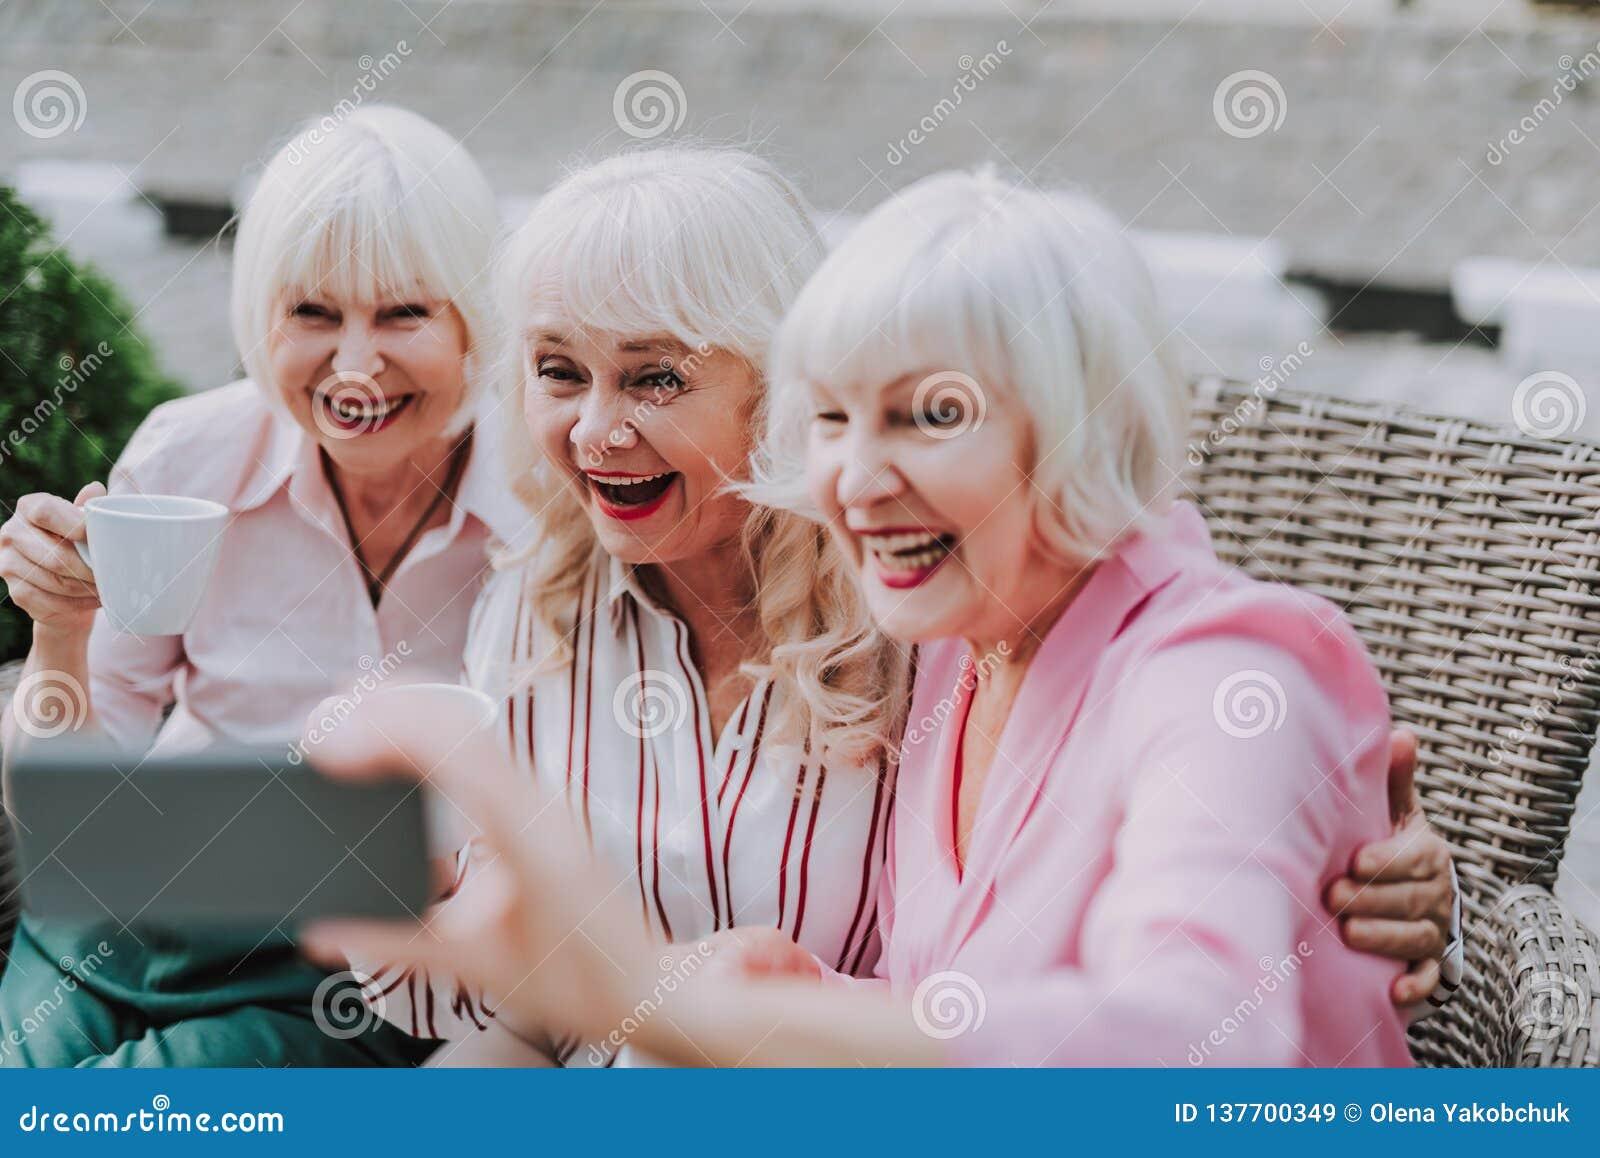 Ladies old cdn.dewtour.com you